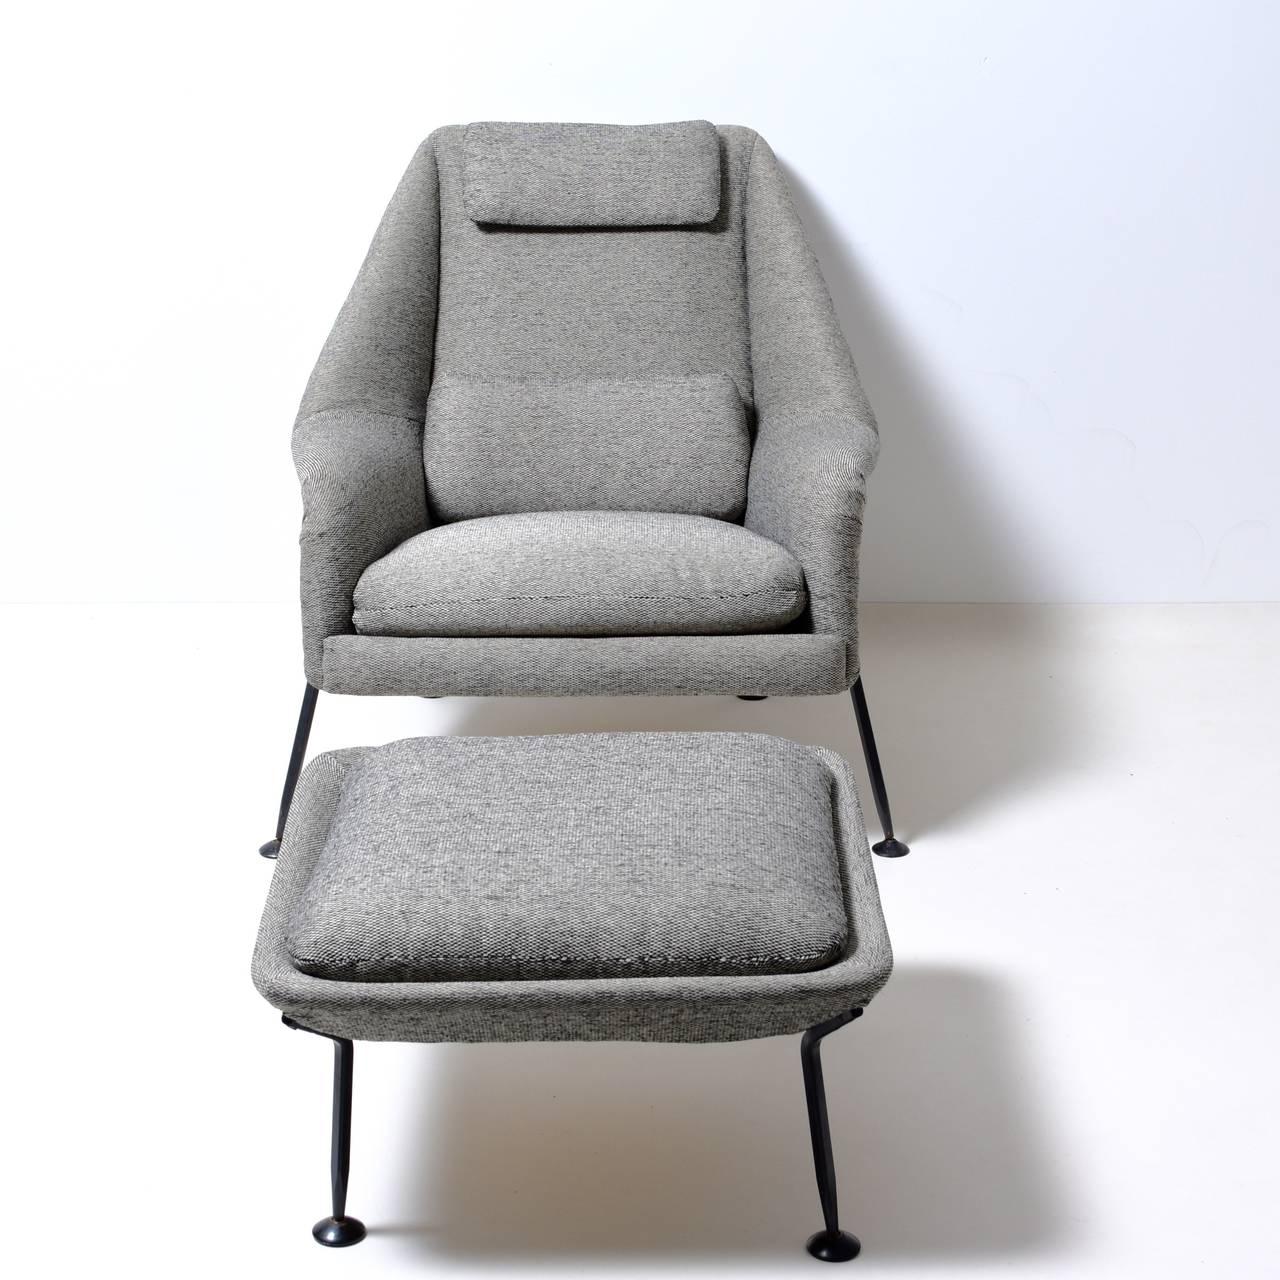 Fabric Ernest Race Heron chair & footstool